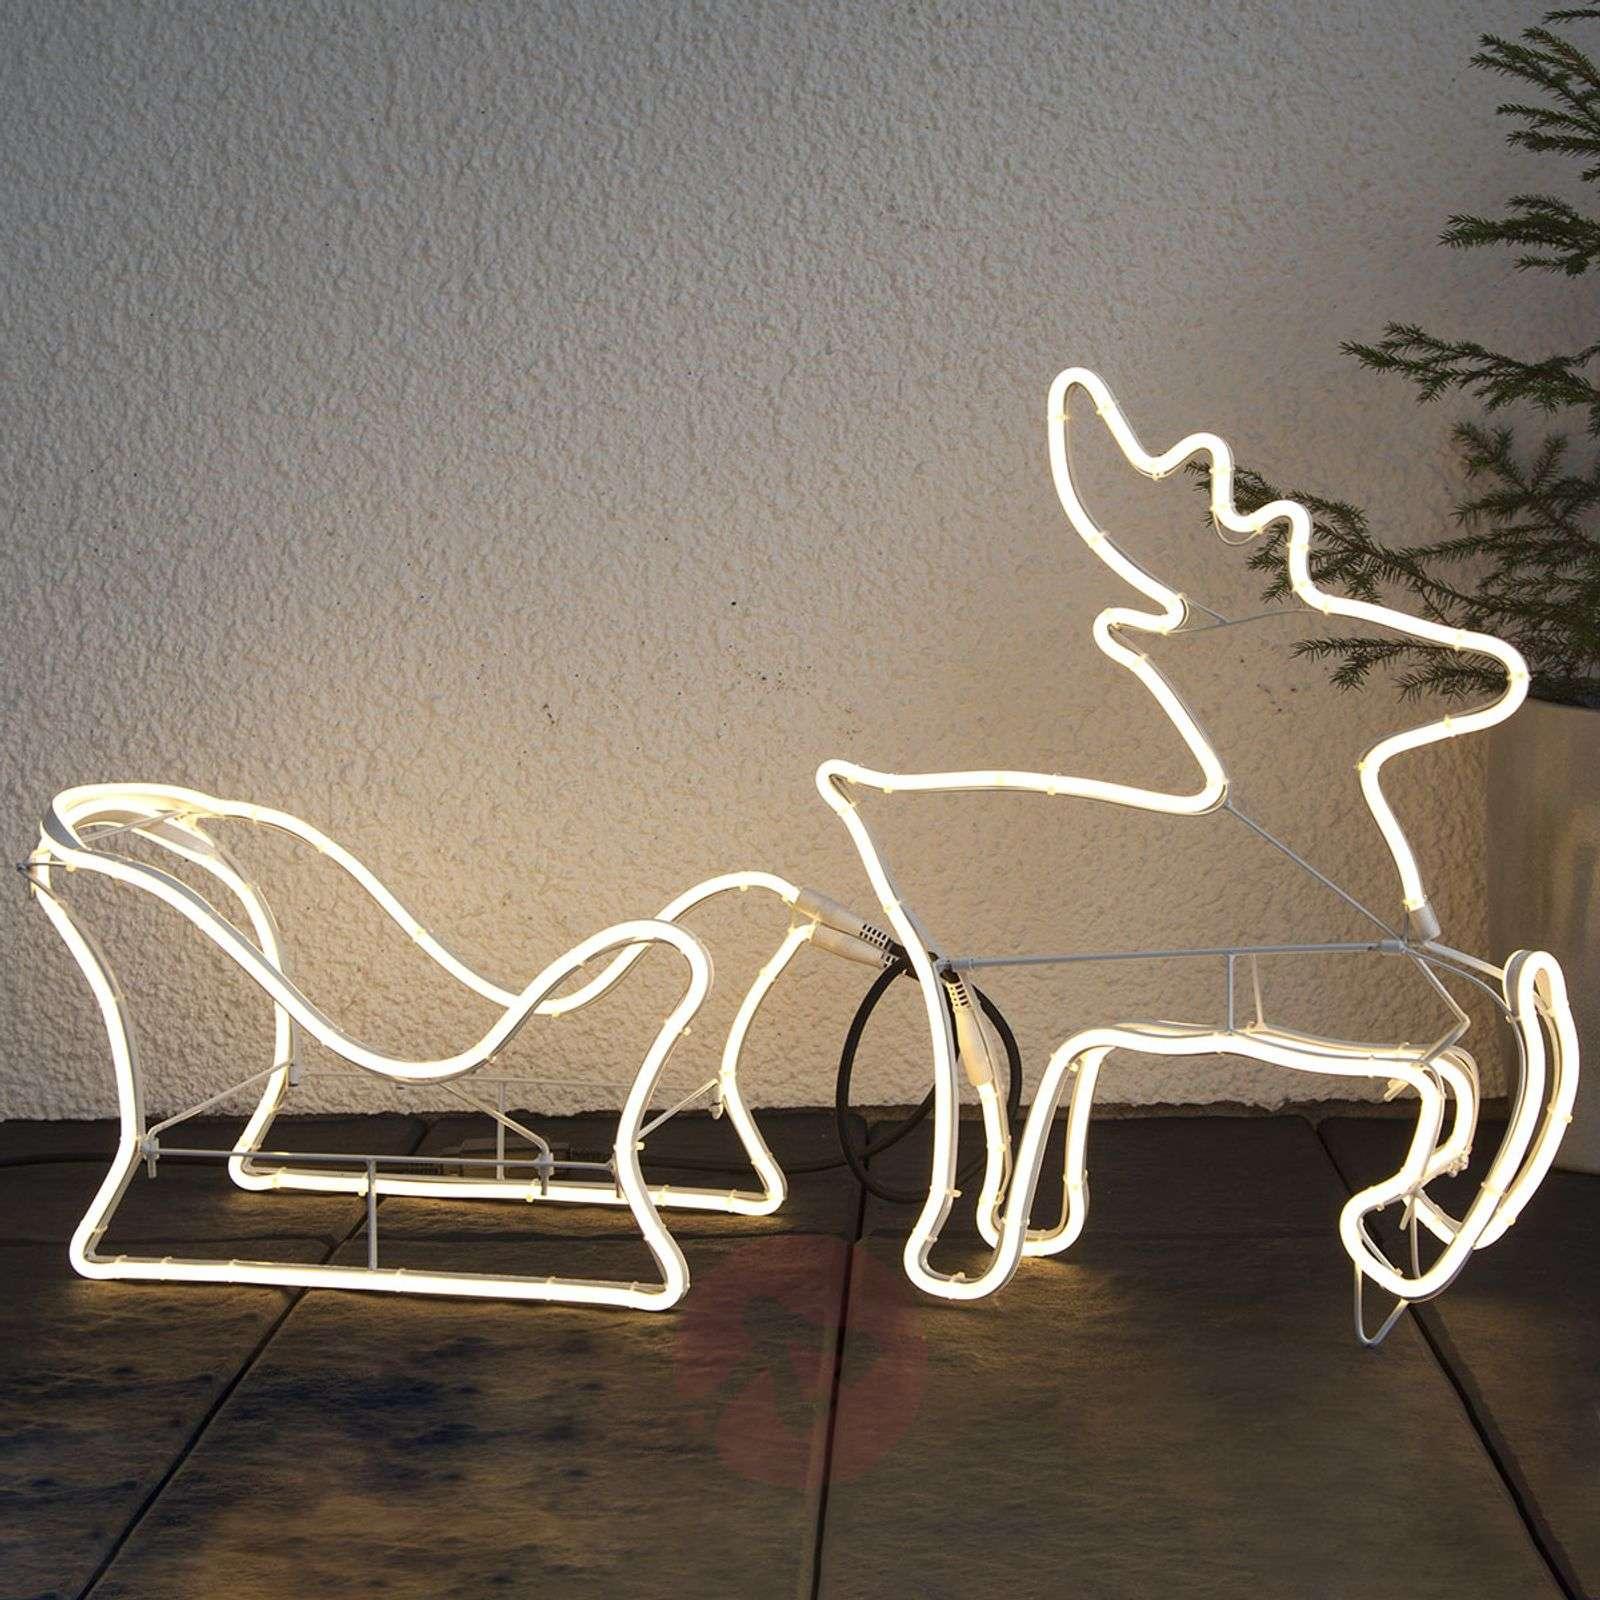 Porokelkka-siluetti LED-koristefiguuri NeoLED-1523461-01